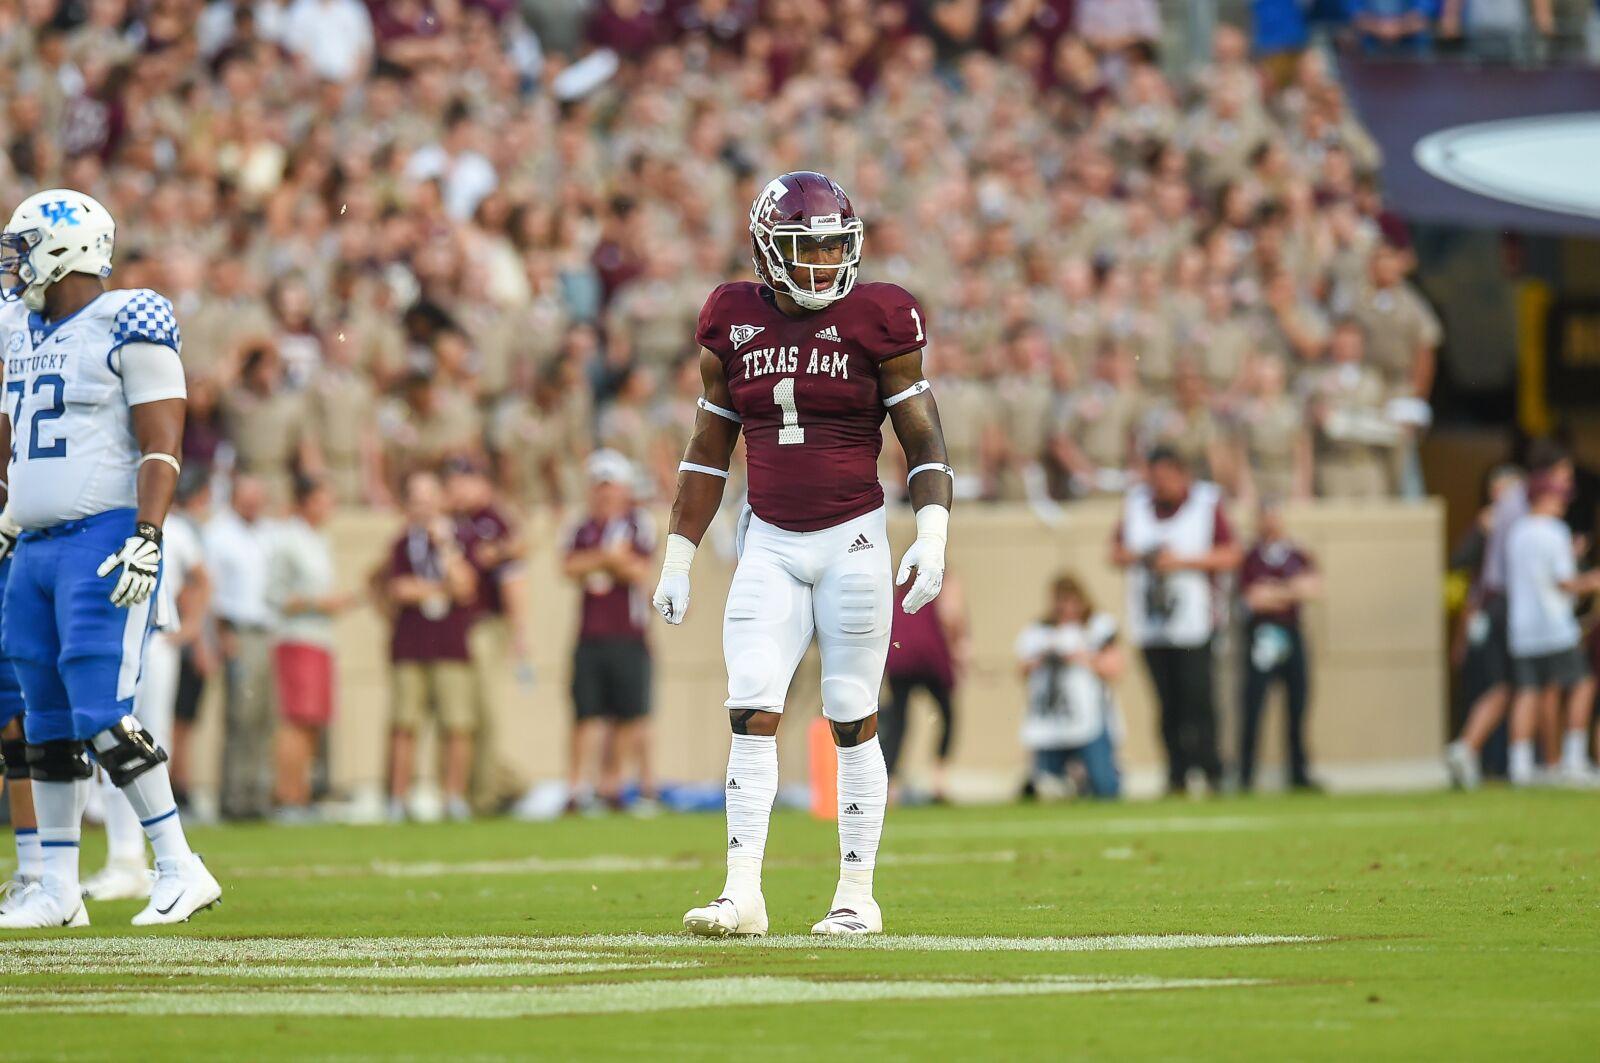 Texas A&M football: Depth at linebacker a major concern for 2019